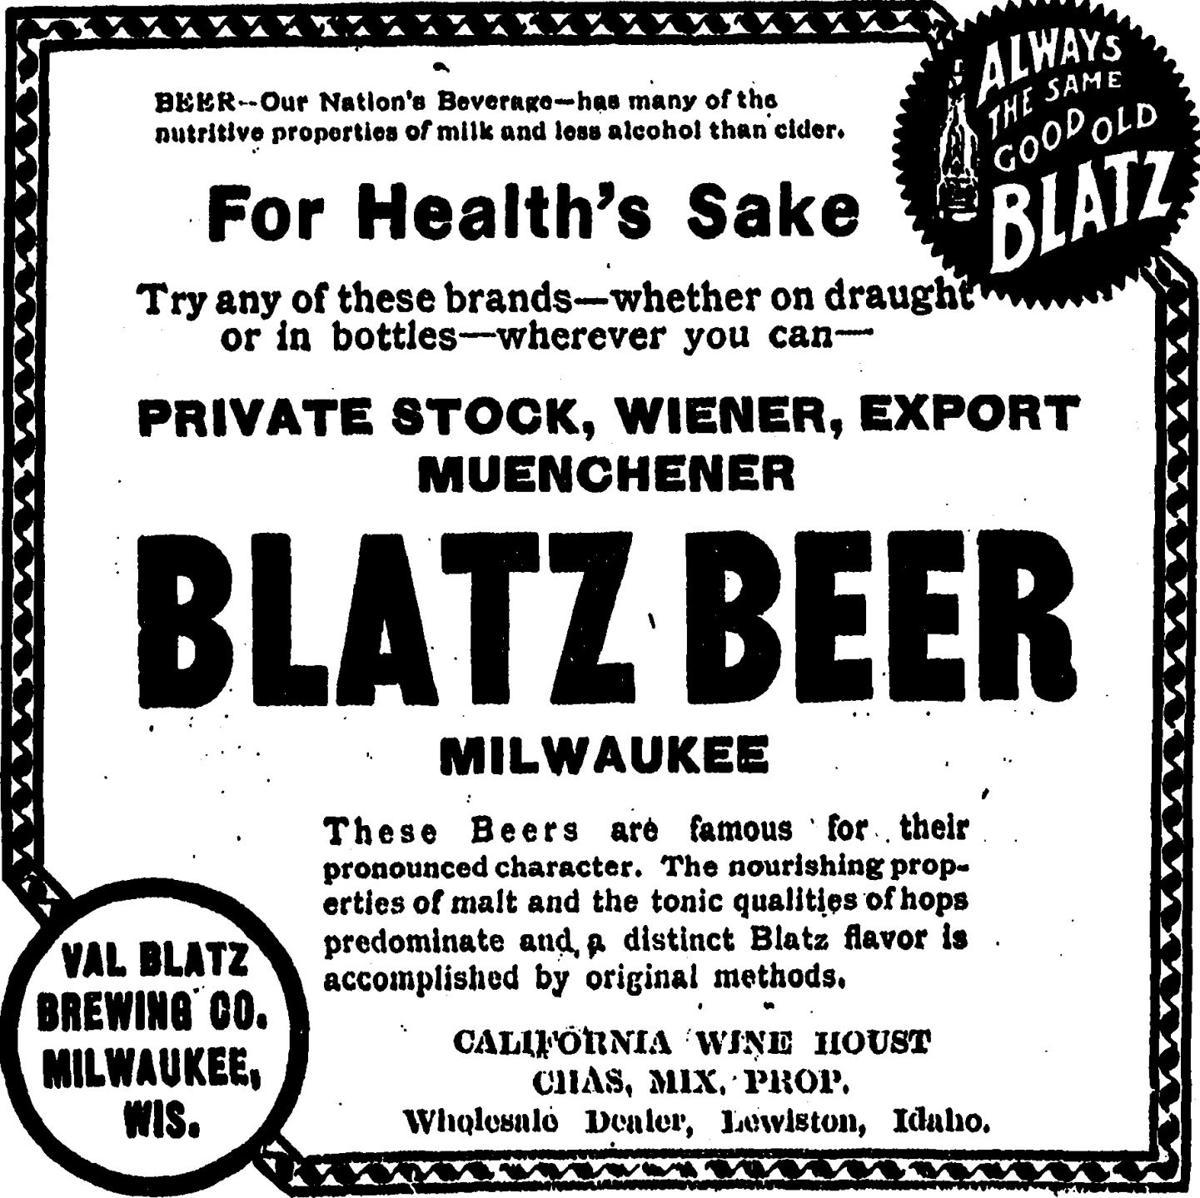 FB Blatz beer.jpg